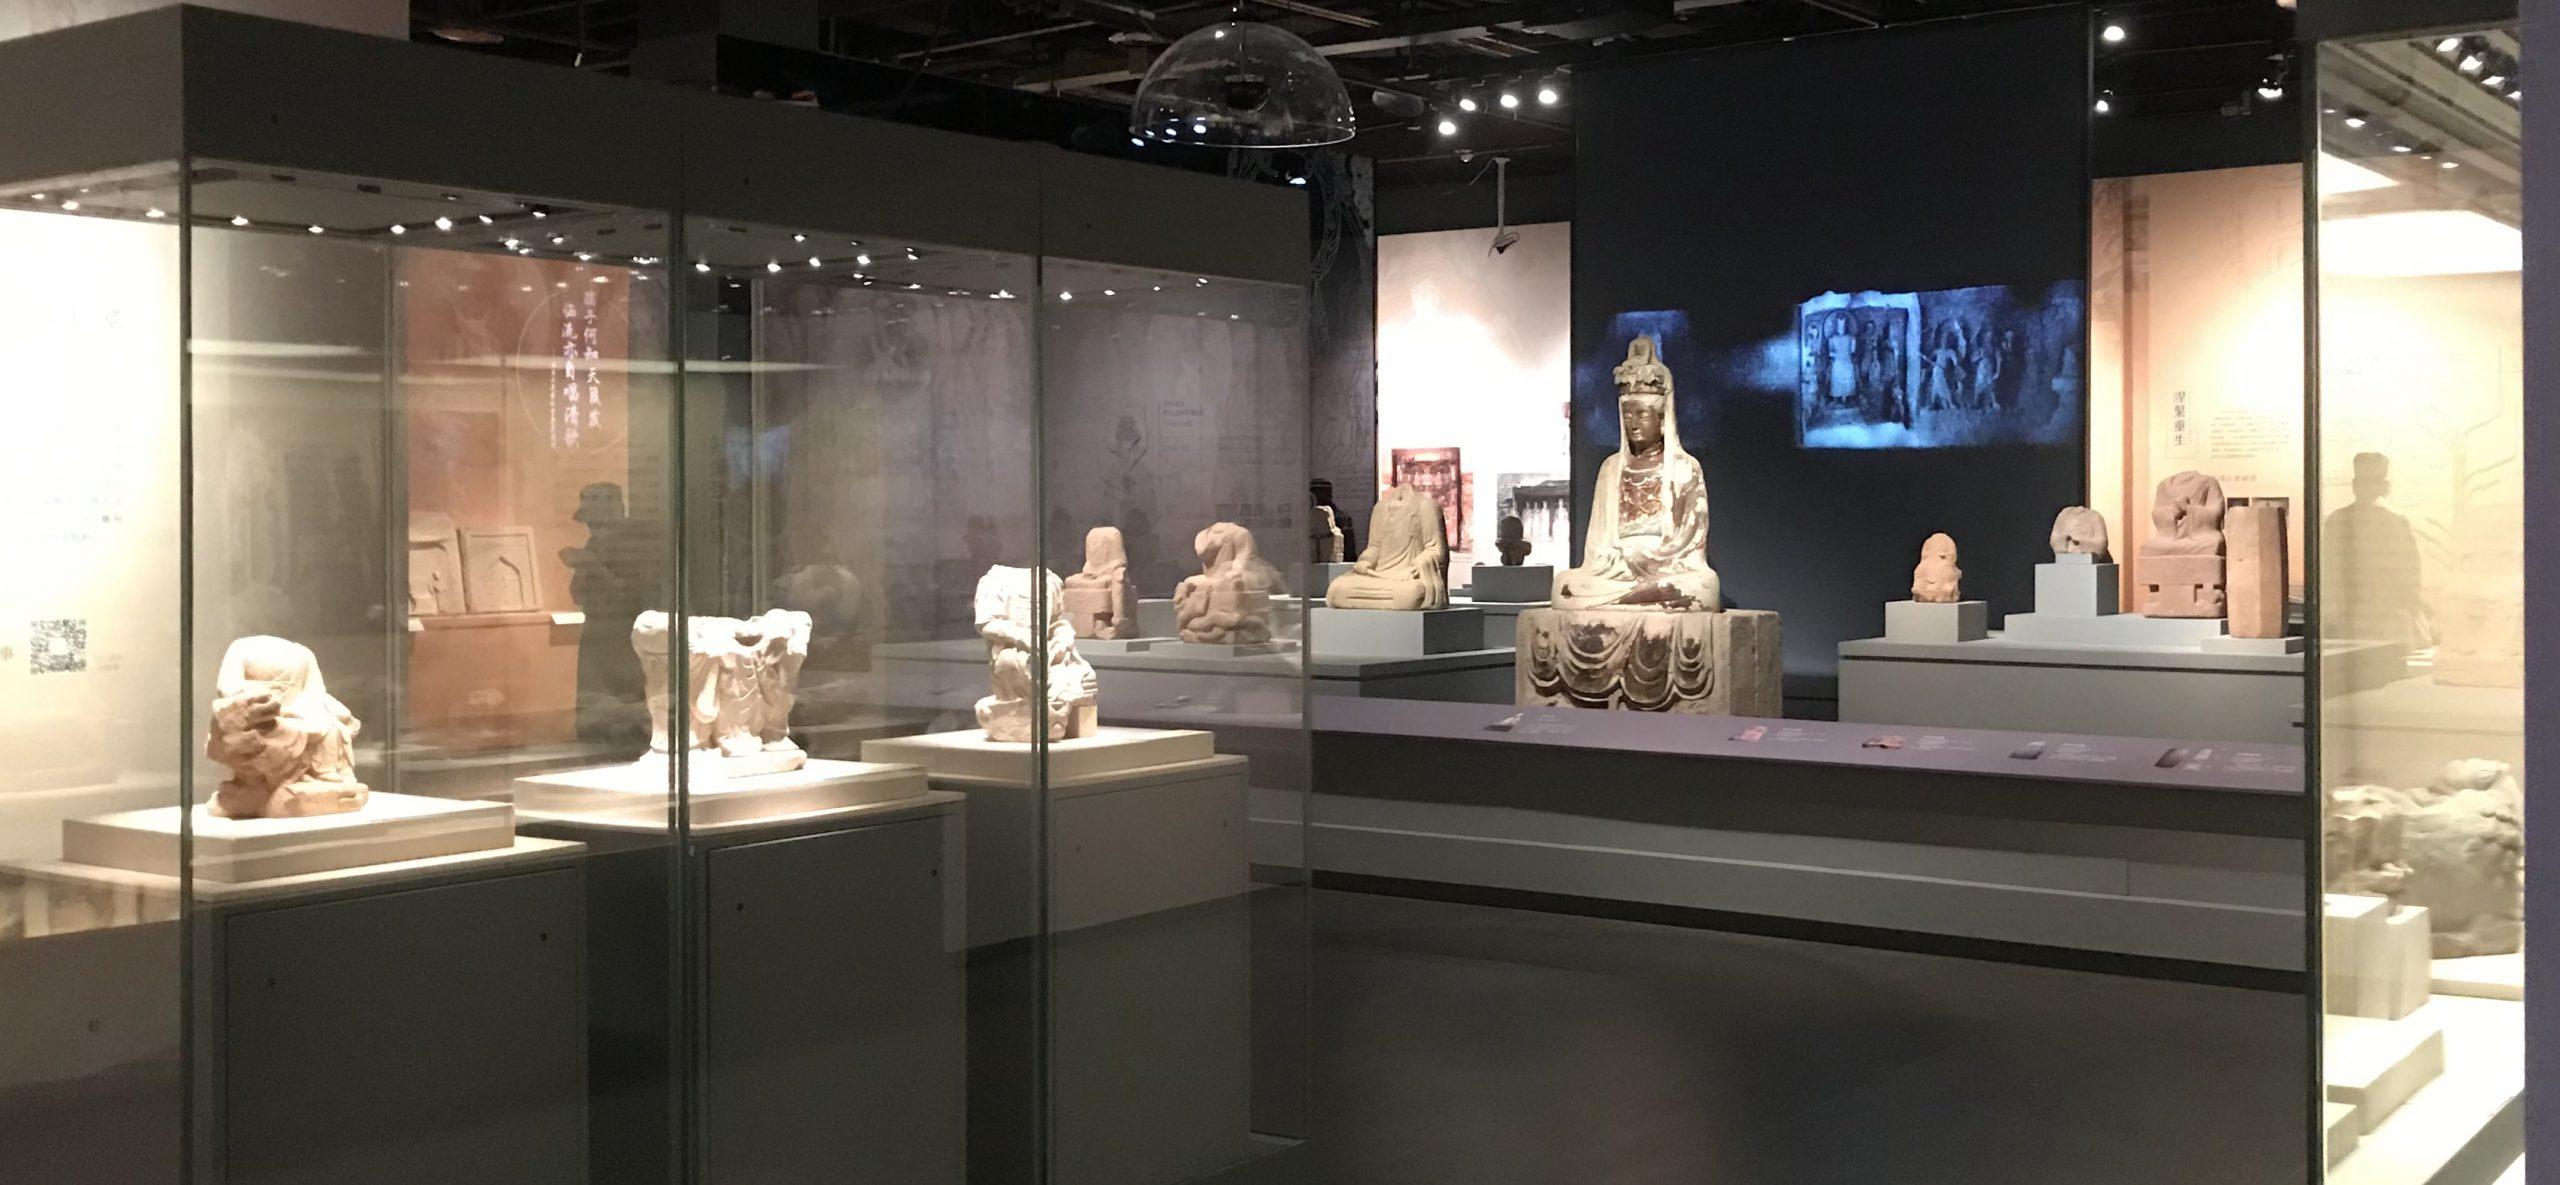 特別展【天下の大足-大足石刻の発見と継承】-金沙遺跡博物館-成都